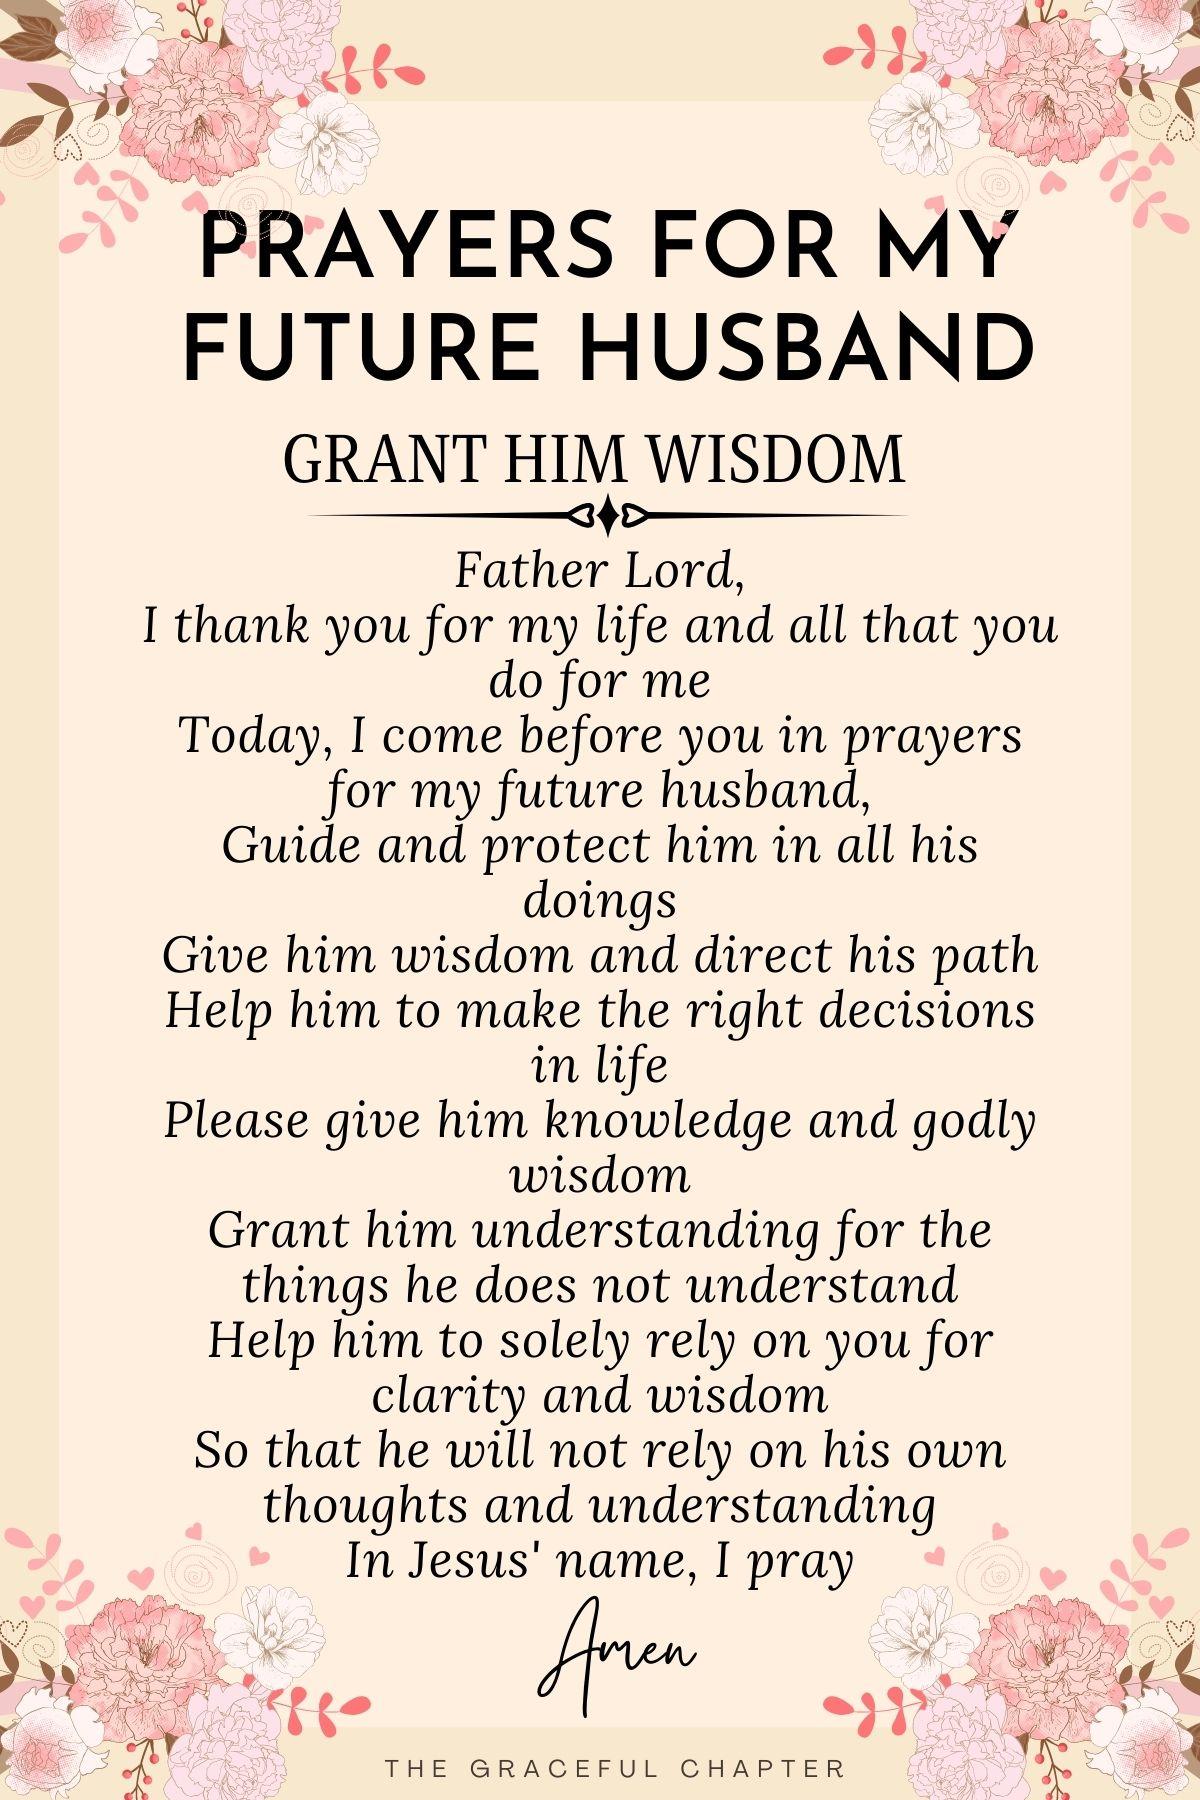 Prayer for my future husband - Grant him wisdom